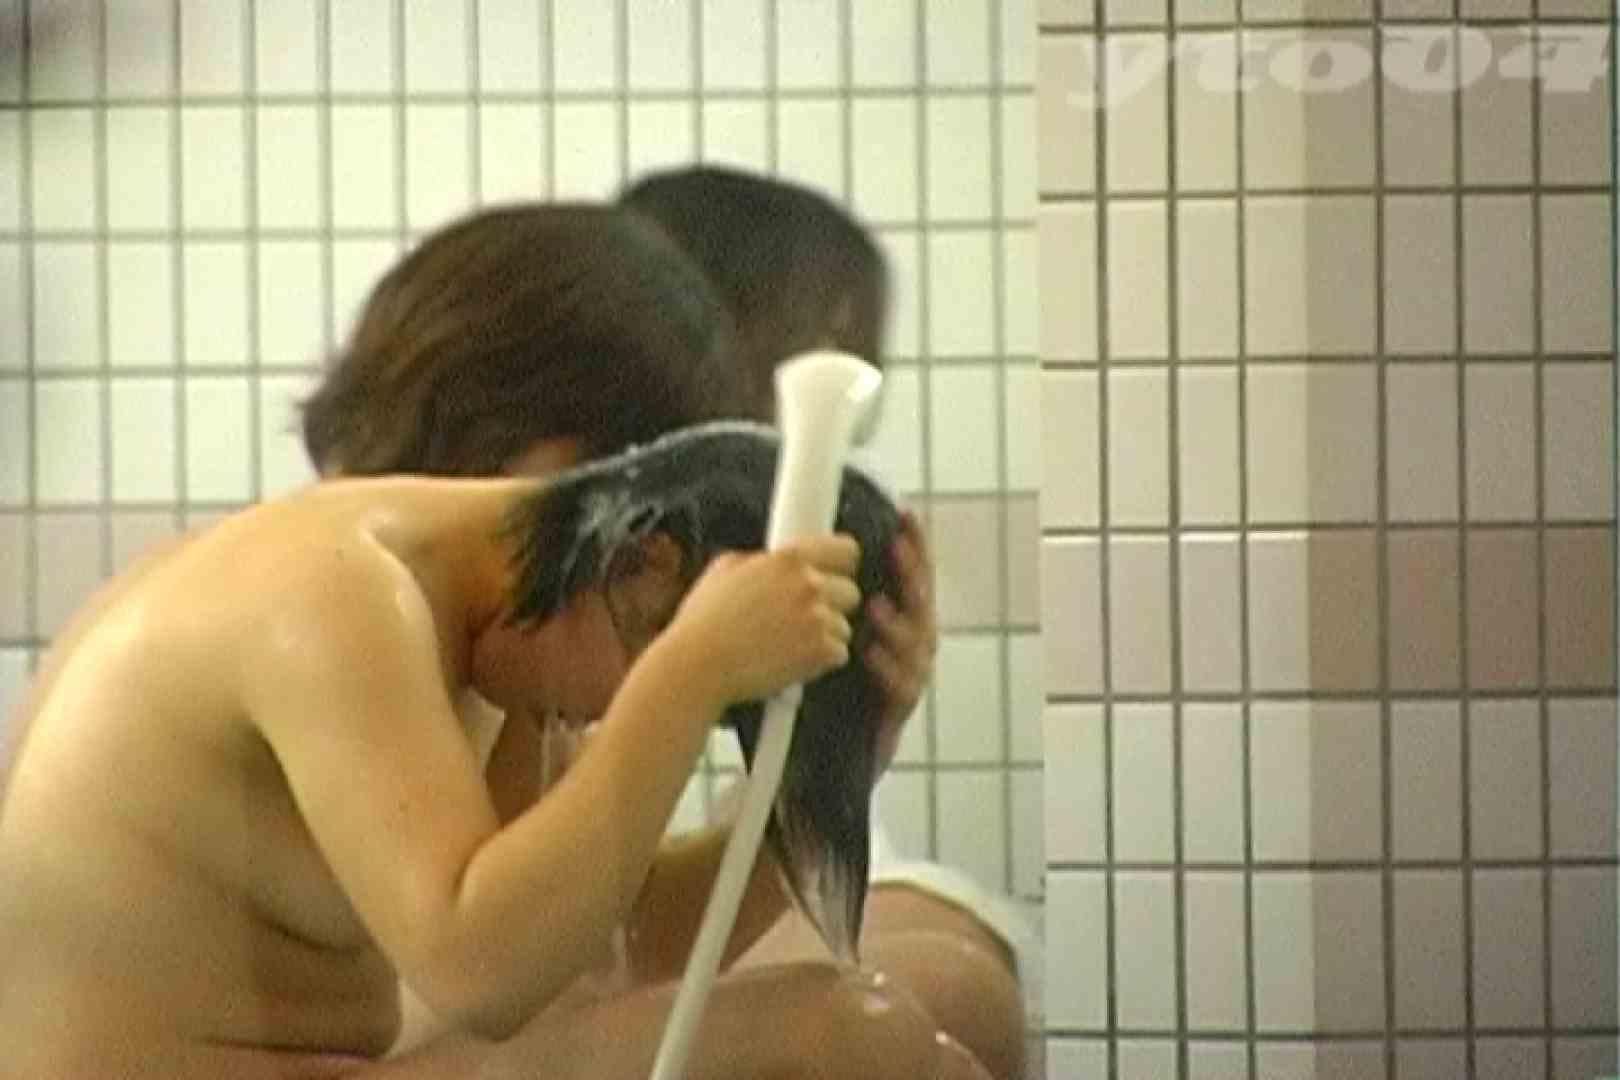 ▲復活限定▲合宿ホテル女風呂盗撮 Vol.24 名作  55pic 5